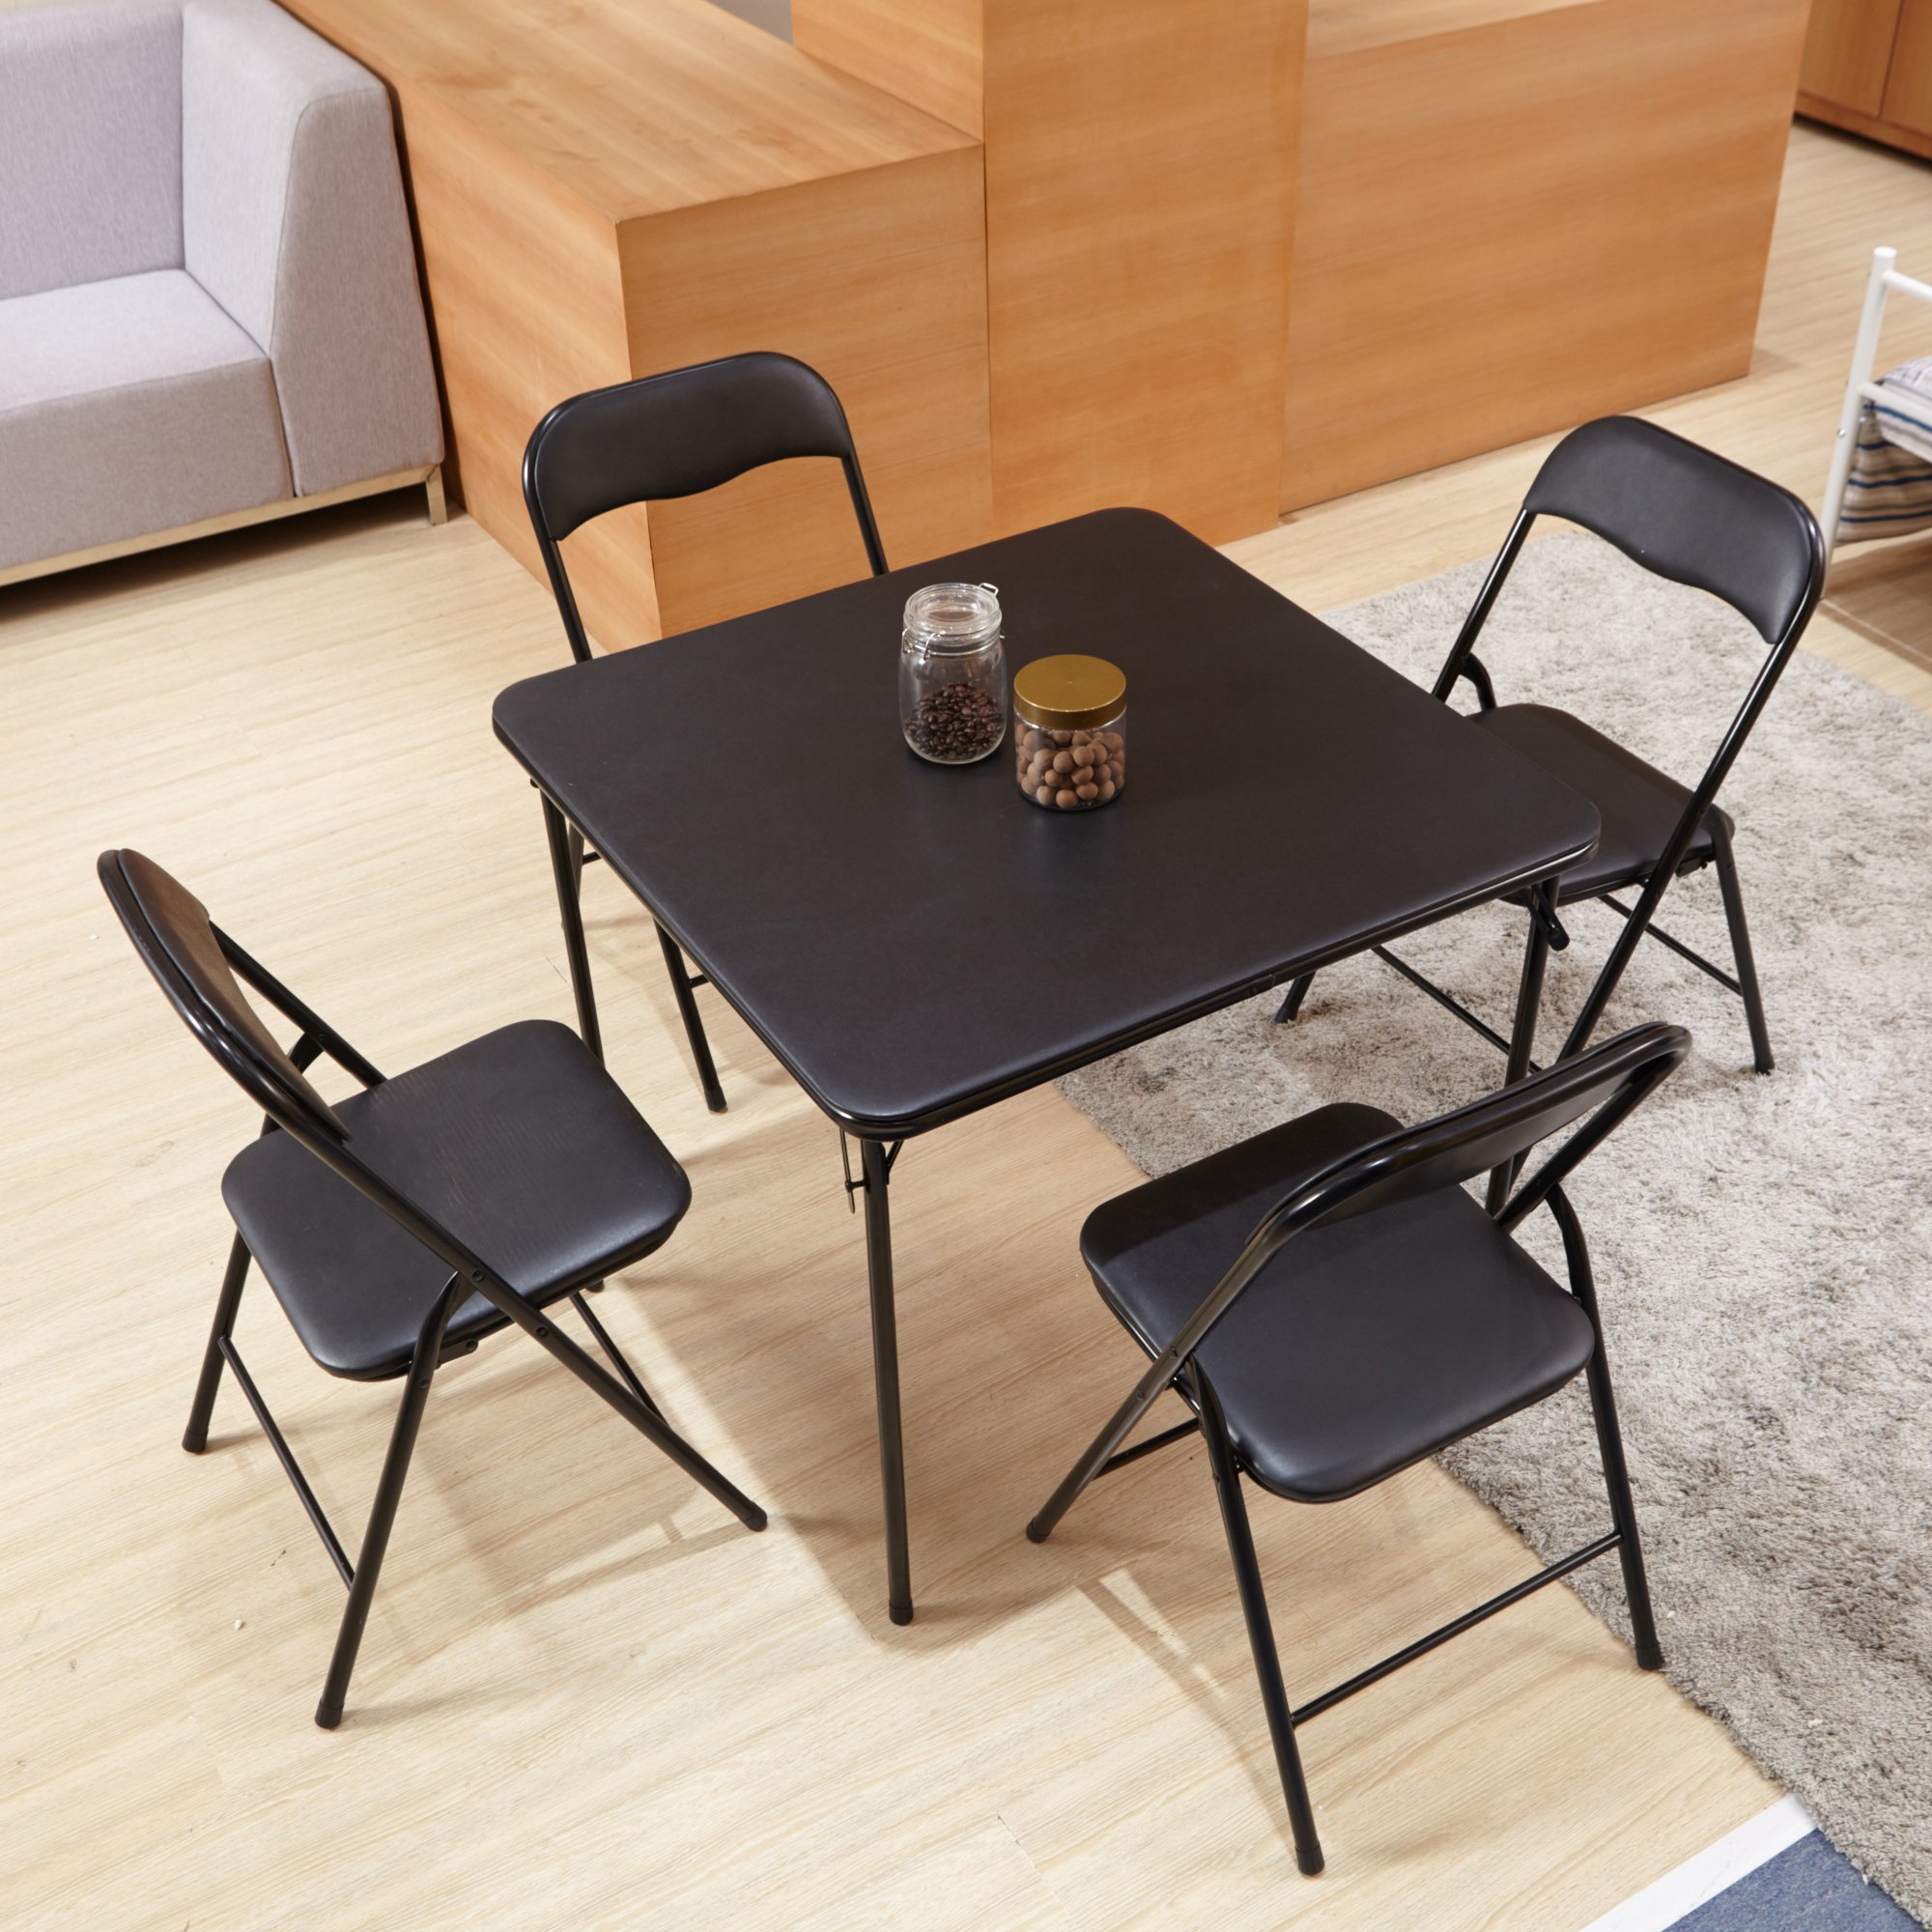 HOMY CASA Homycasa Folding Square Set of 4 Dining Table ...